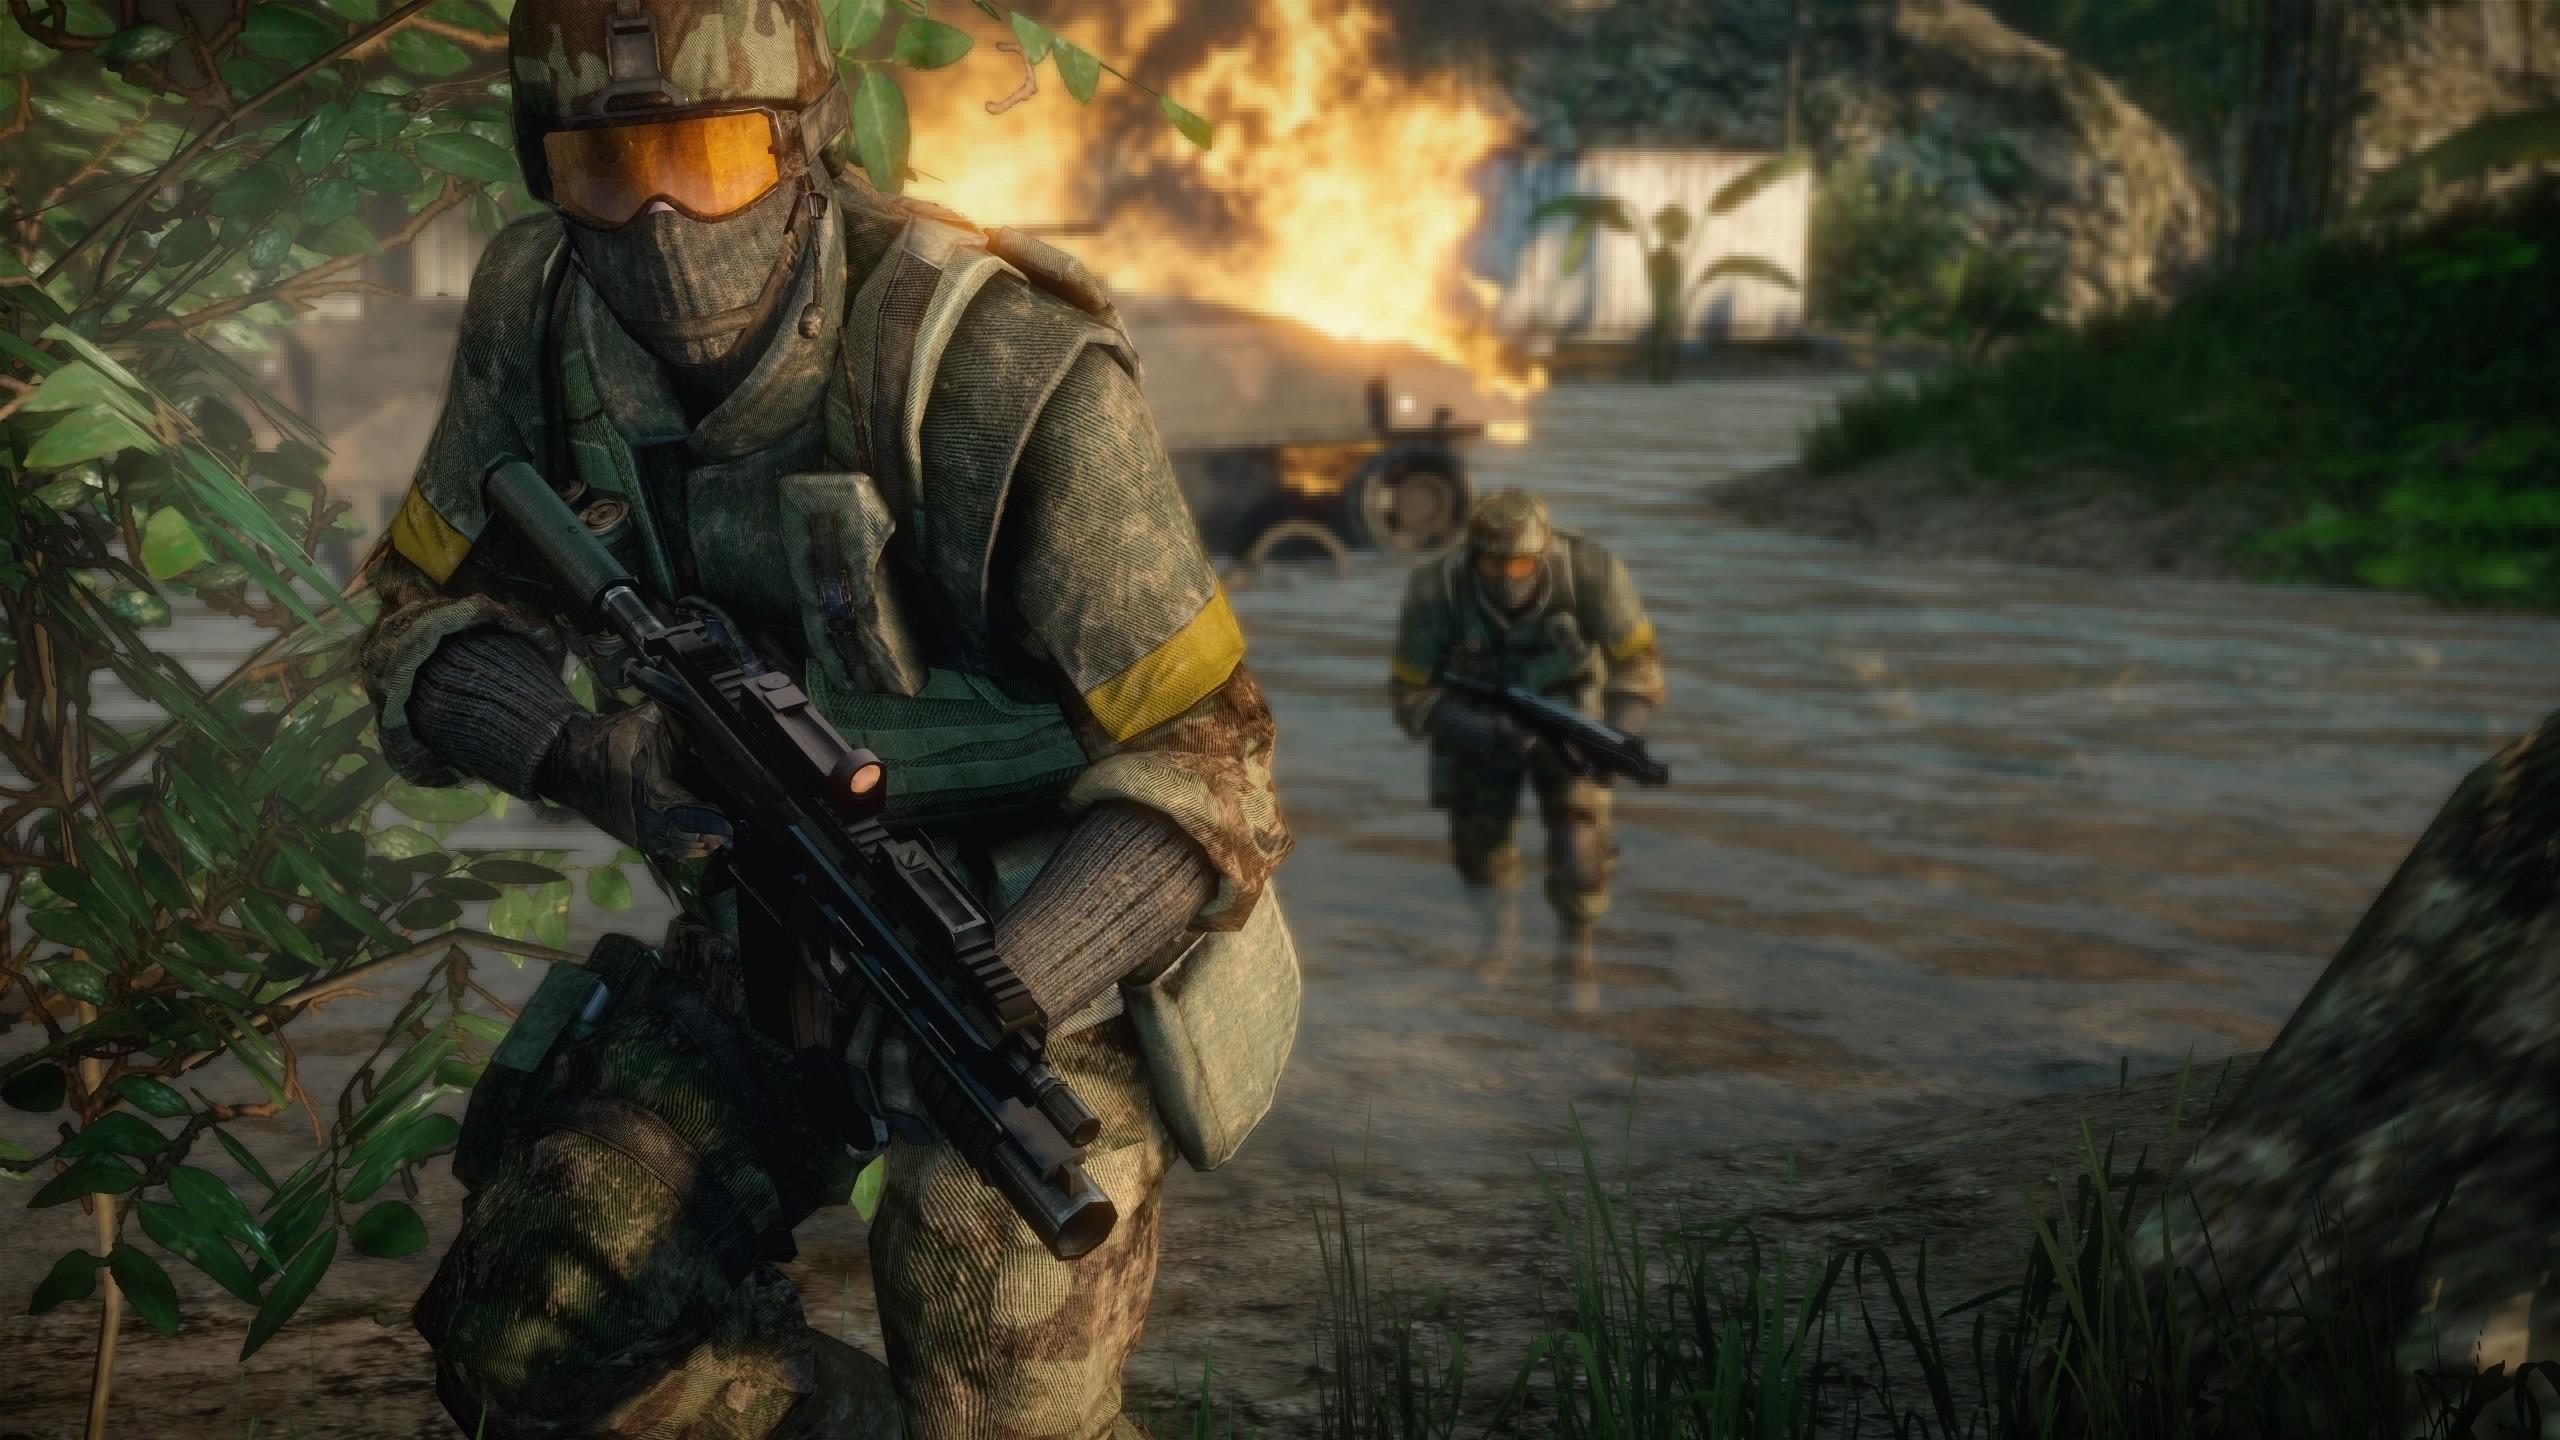 Wallpapers Battlefield Battlefield 2 Games 2560×1440